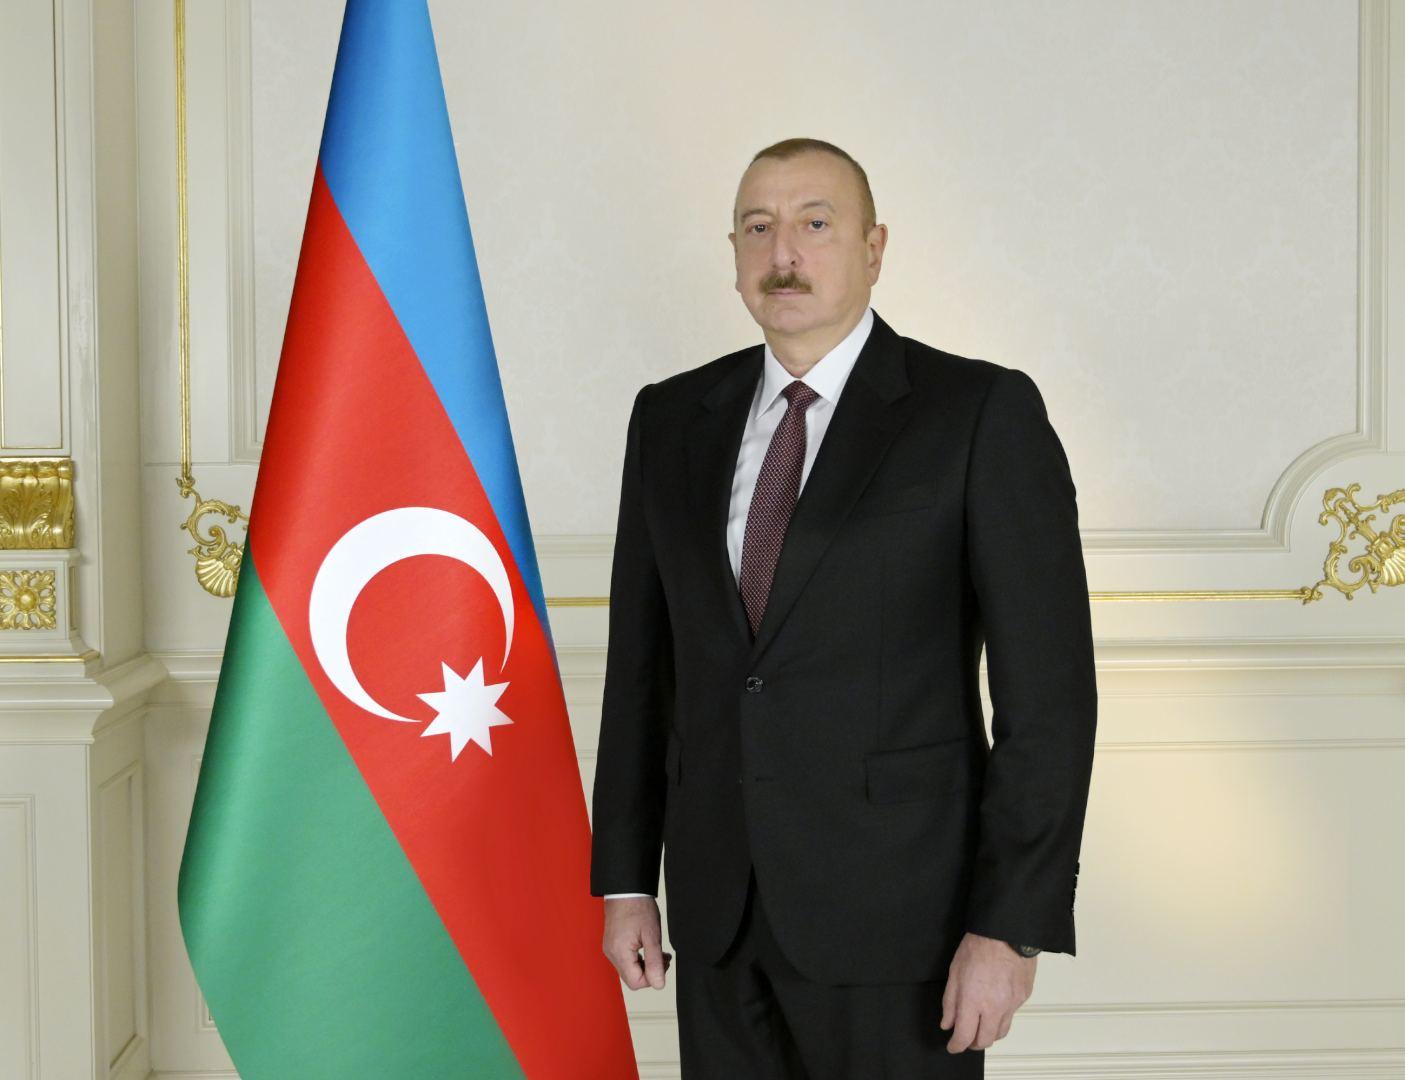 President Aliyev congratulates Azerbaijani people on the occasion of Eid al-Adha